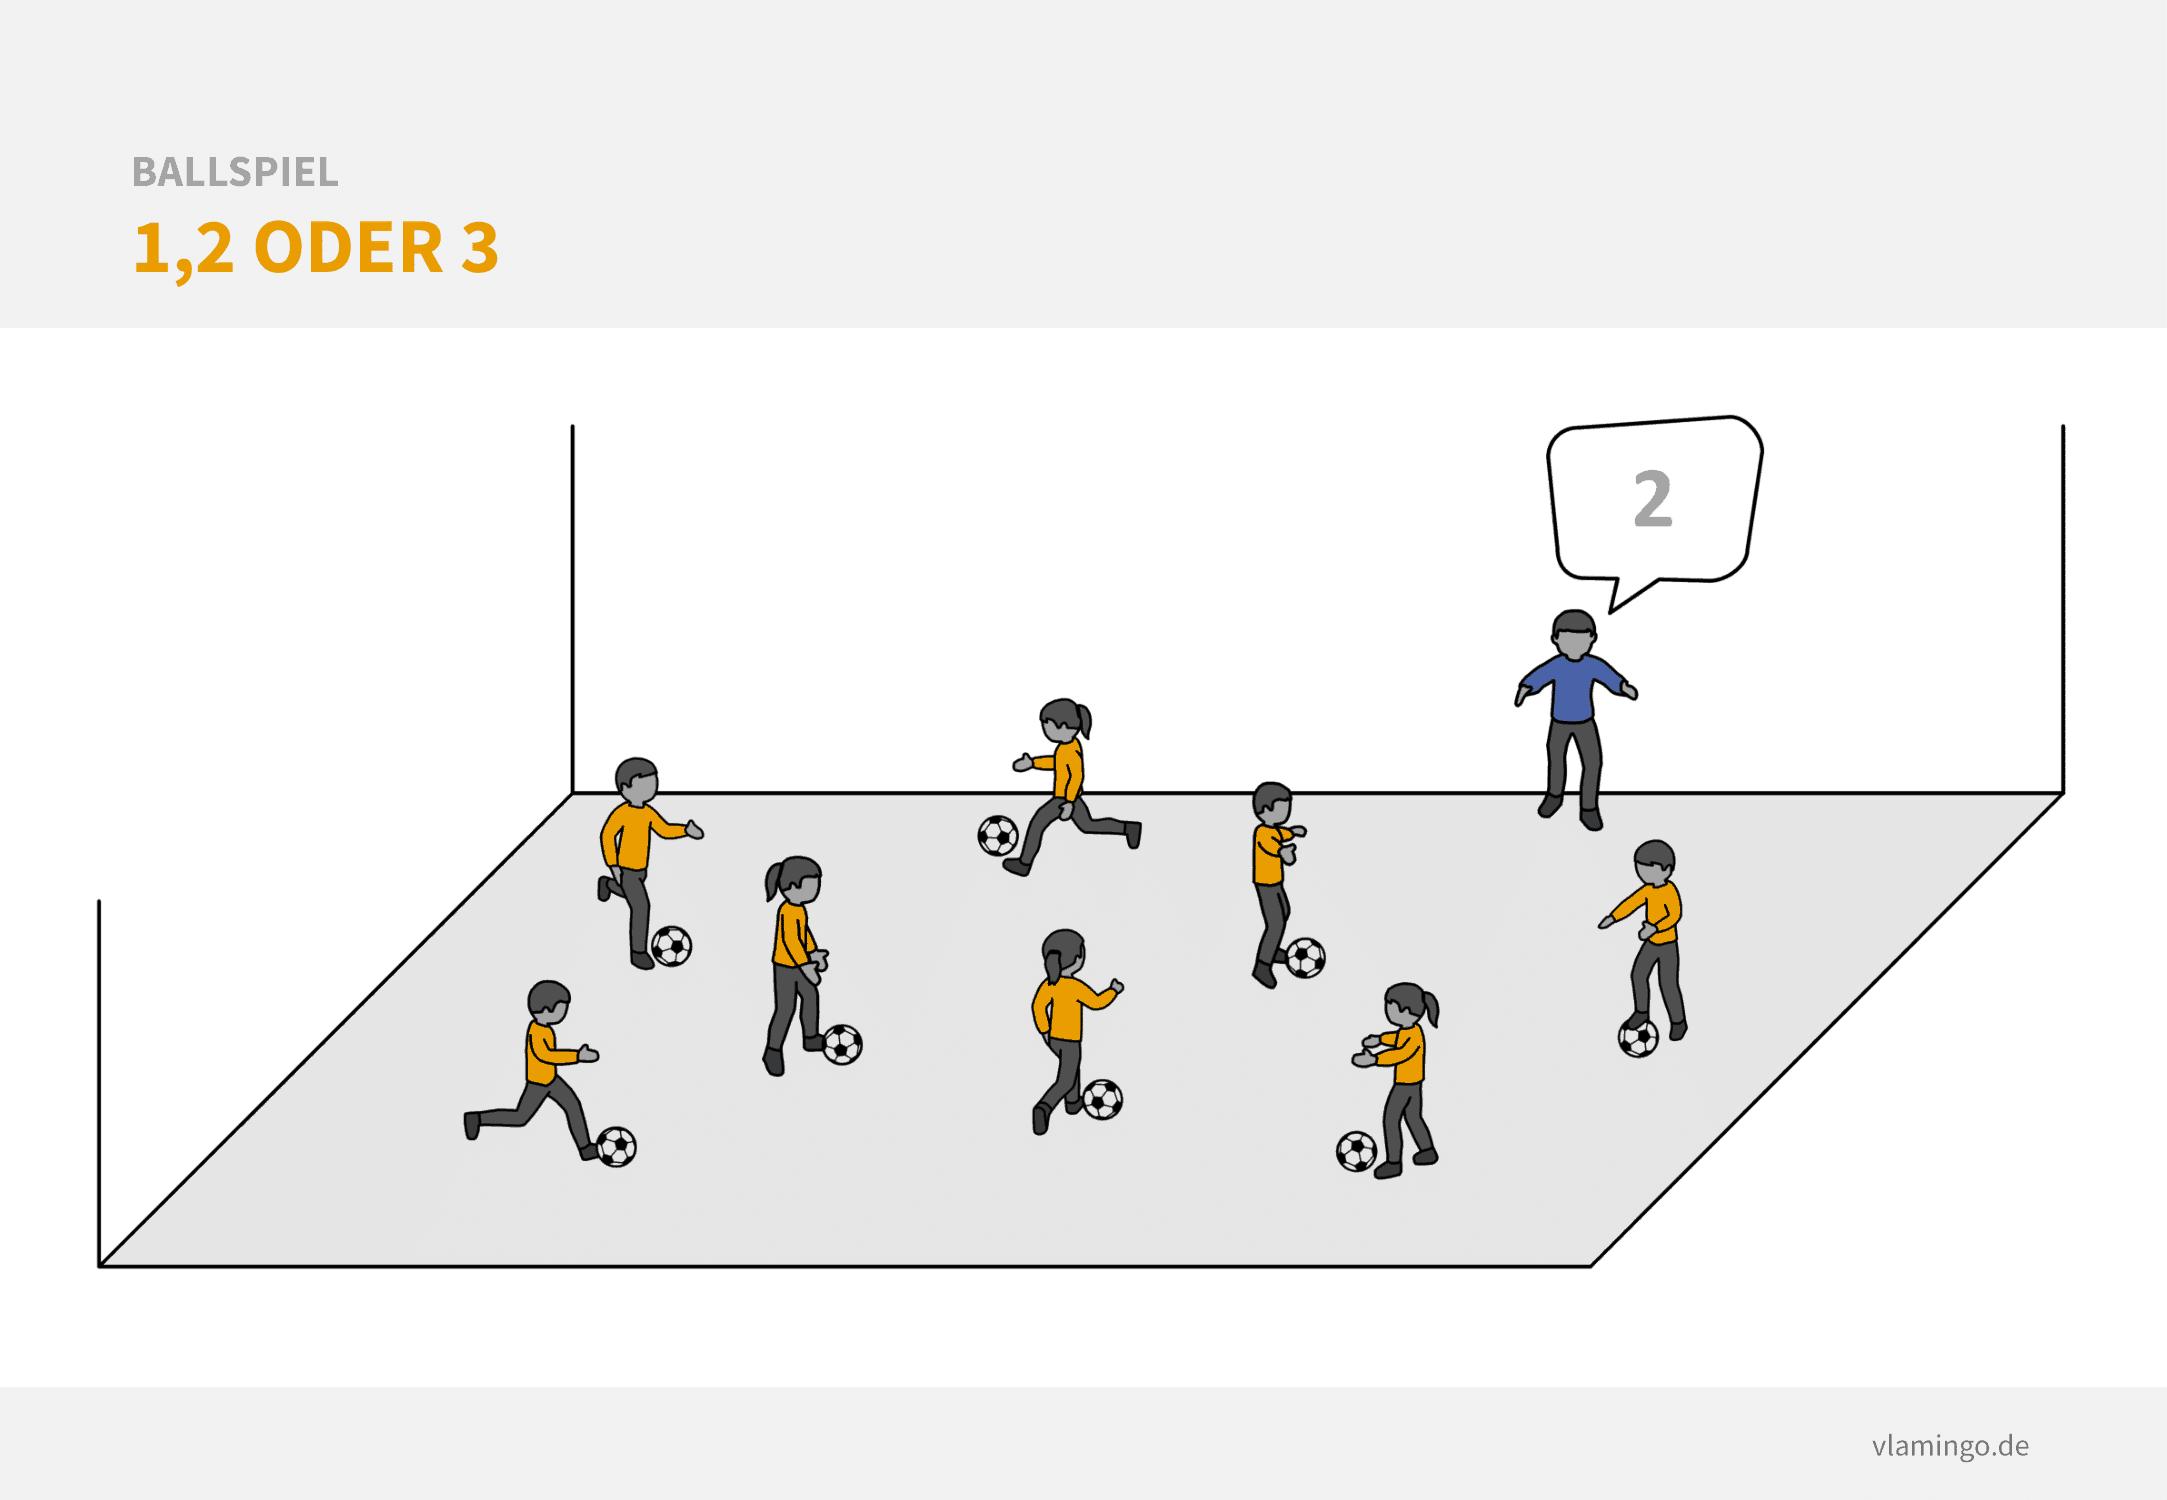 Fußball Aufwärmübung: 1, 2 oder 3